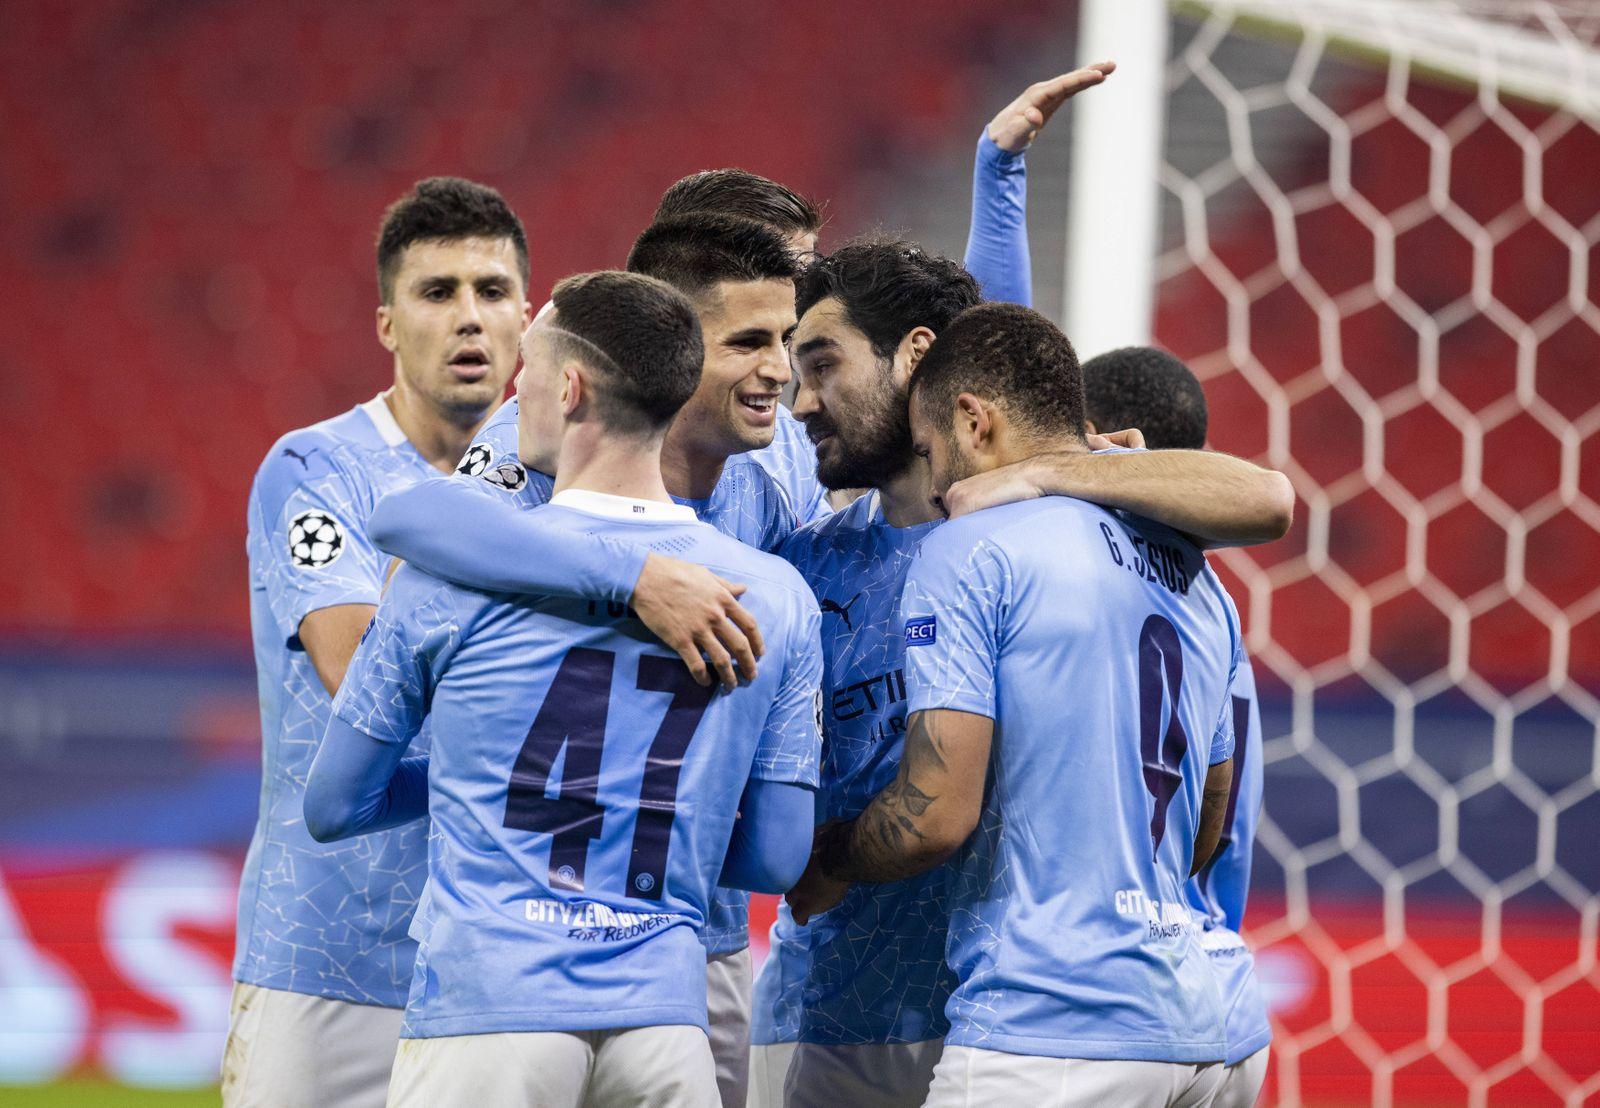 Torjubel: Joao Cancelo (City), Ilkay Gündogan (City), Gabriel Jesus (City), Bernardo Silva (City) Borussia Mönchengladb